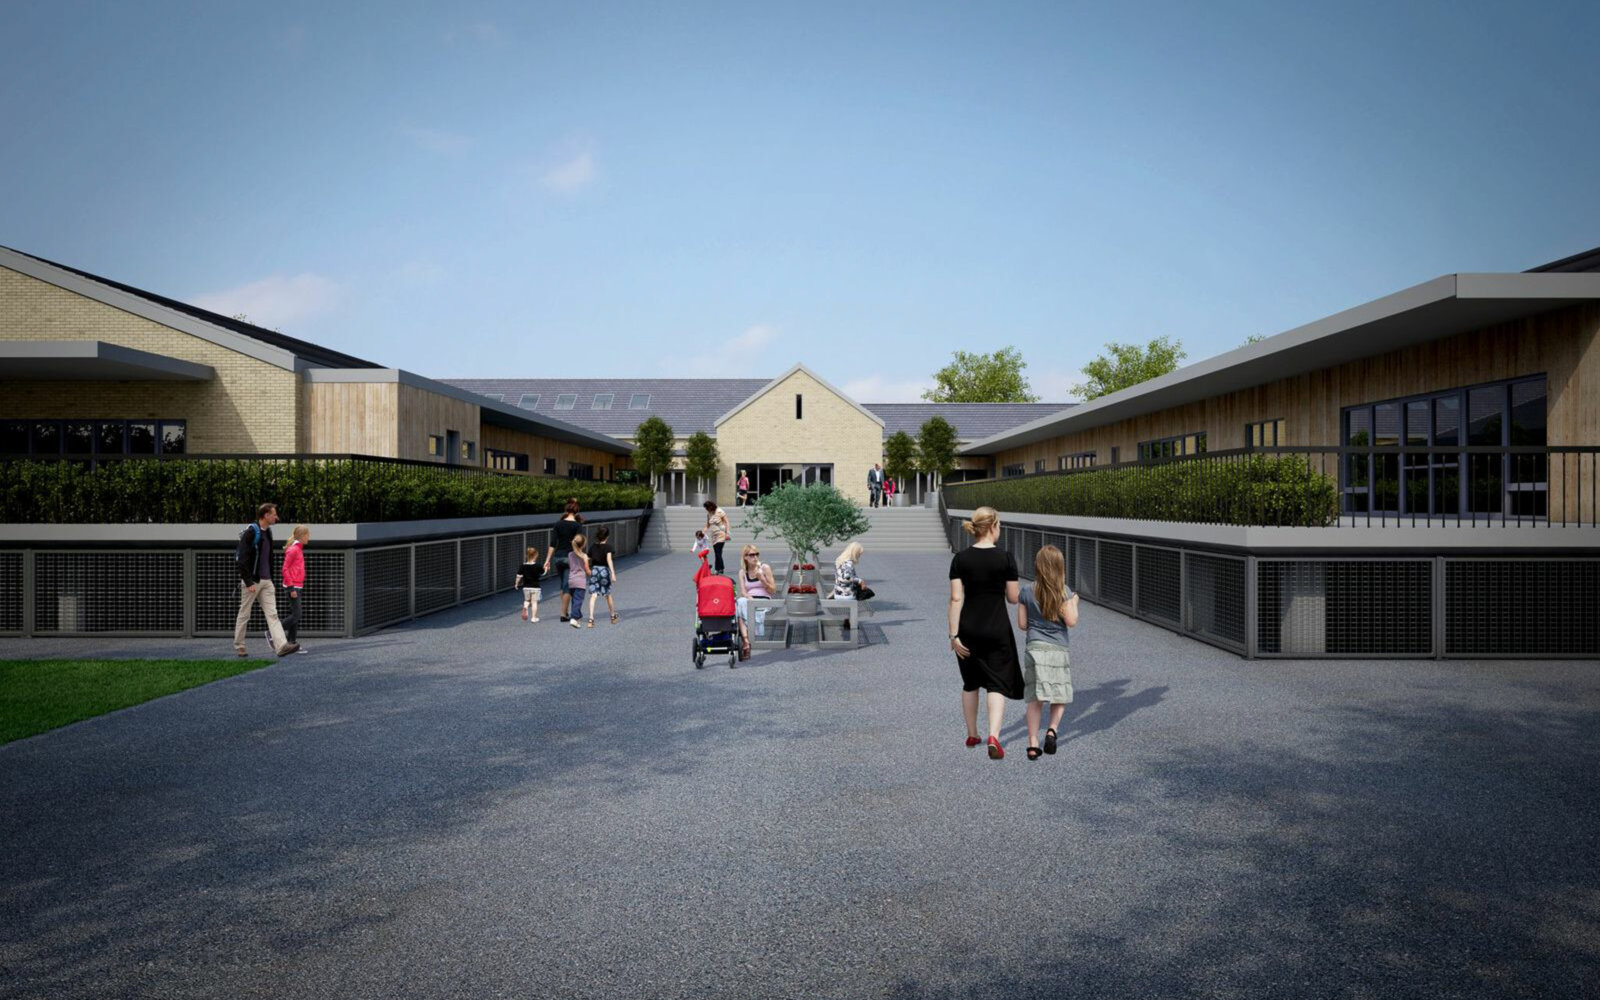 Oldfield Primary School entrance CGI